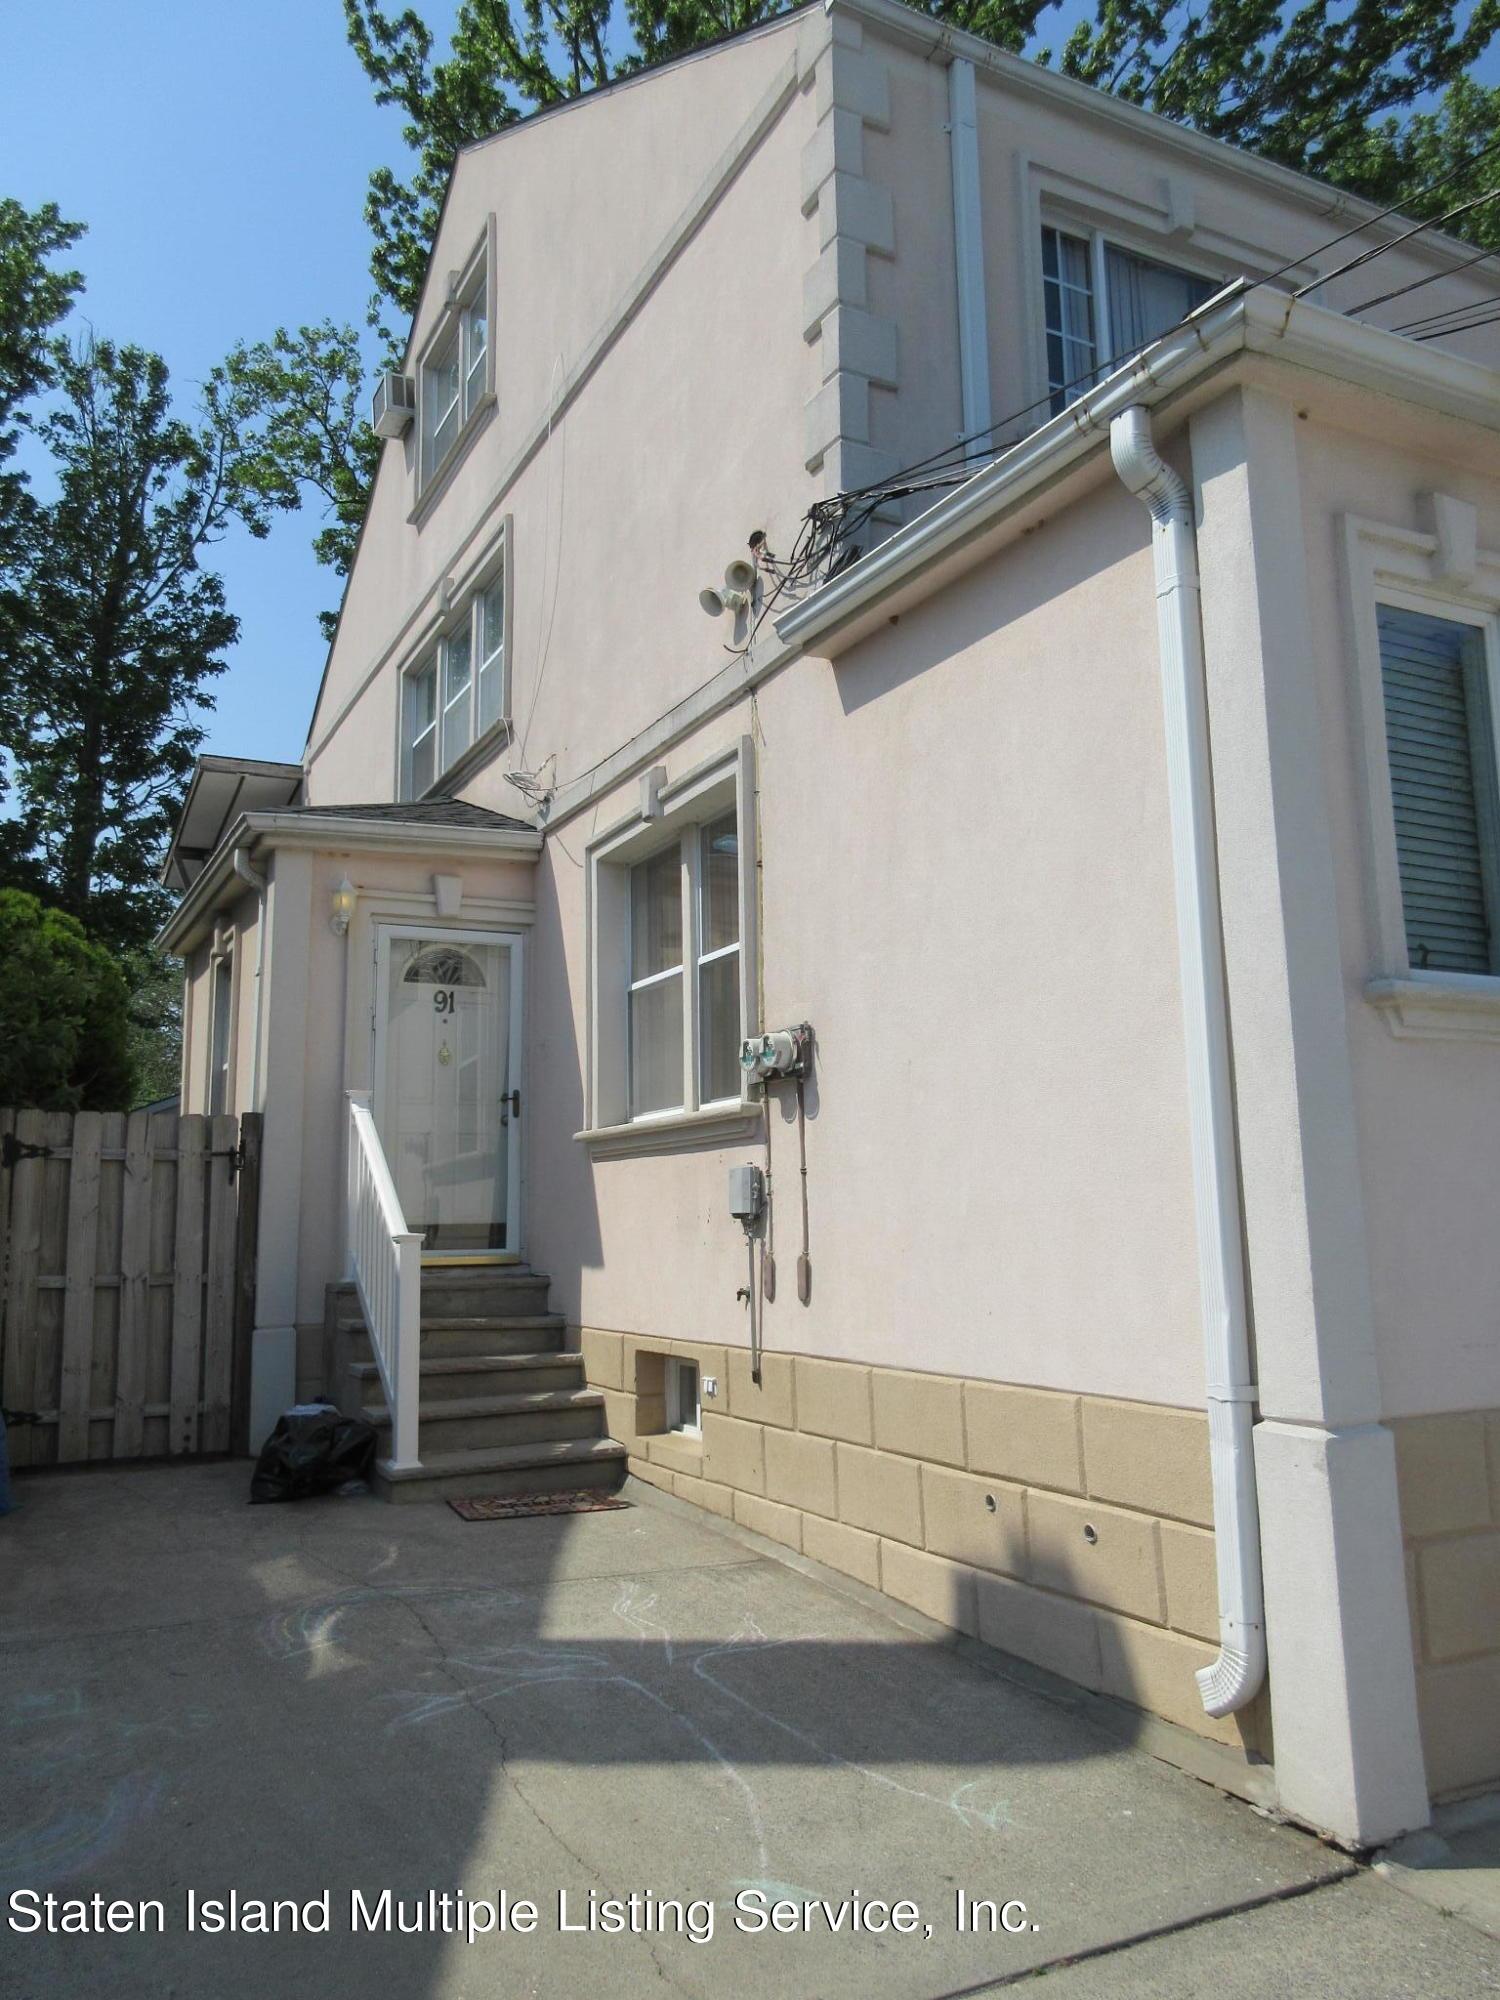 Two Family - Detached 89-91 David Street  Staten Island, NY 10308, MLS-1146516-5